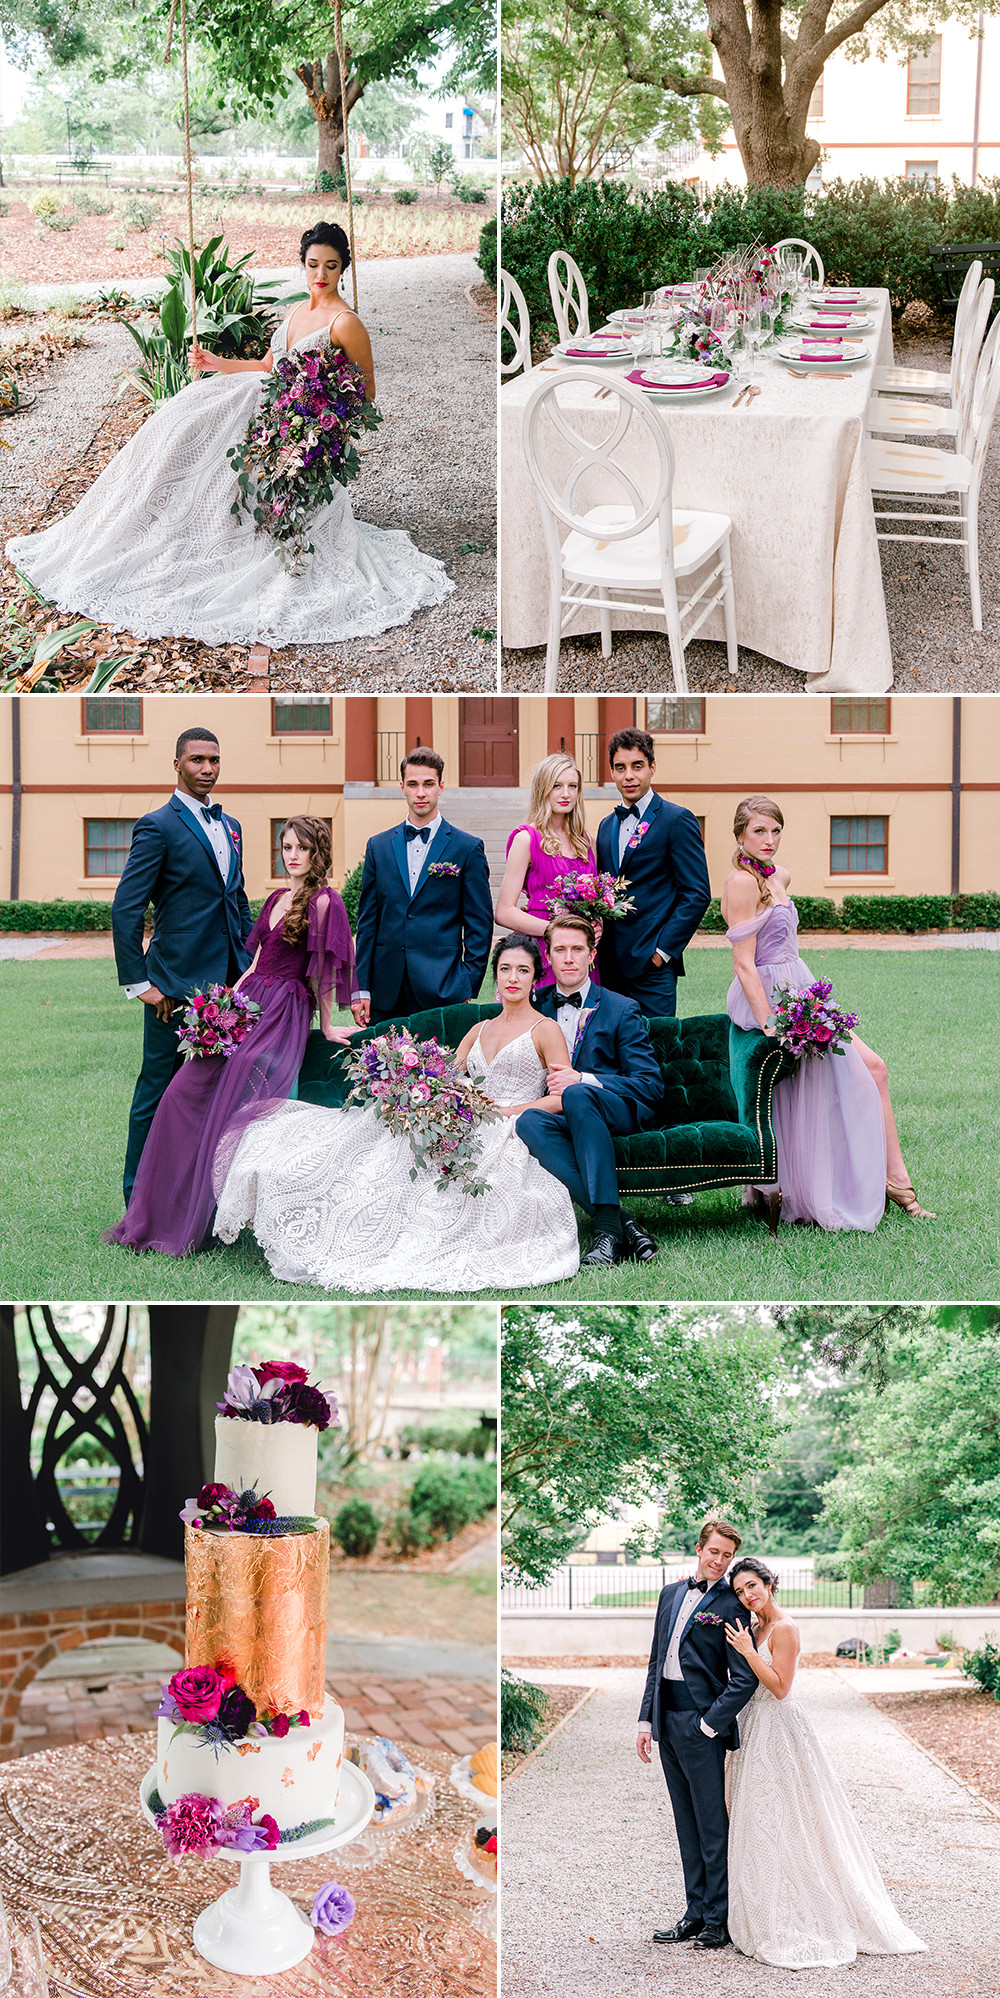 Wedding at The Hampton Preston Mansion | Nina Bashaw is a fine art portrait and wedding photographer serving Columbia, Charleston, Greenville, Charlotte, NC Augusta, Ga, Nashville, TN surrounding areas and worldwide destination weddings and elopements.